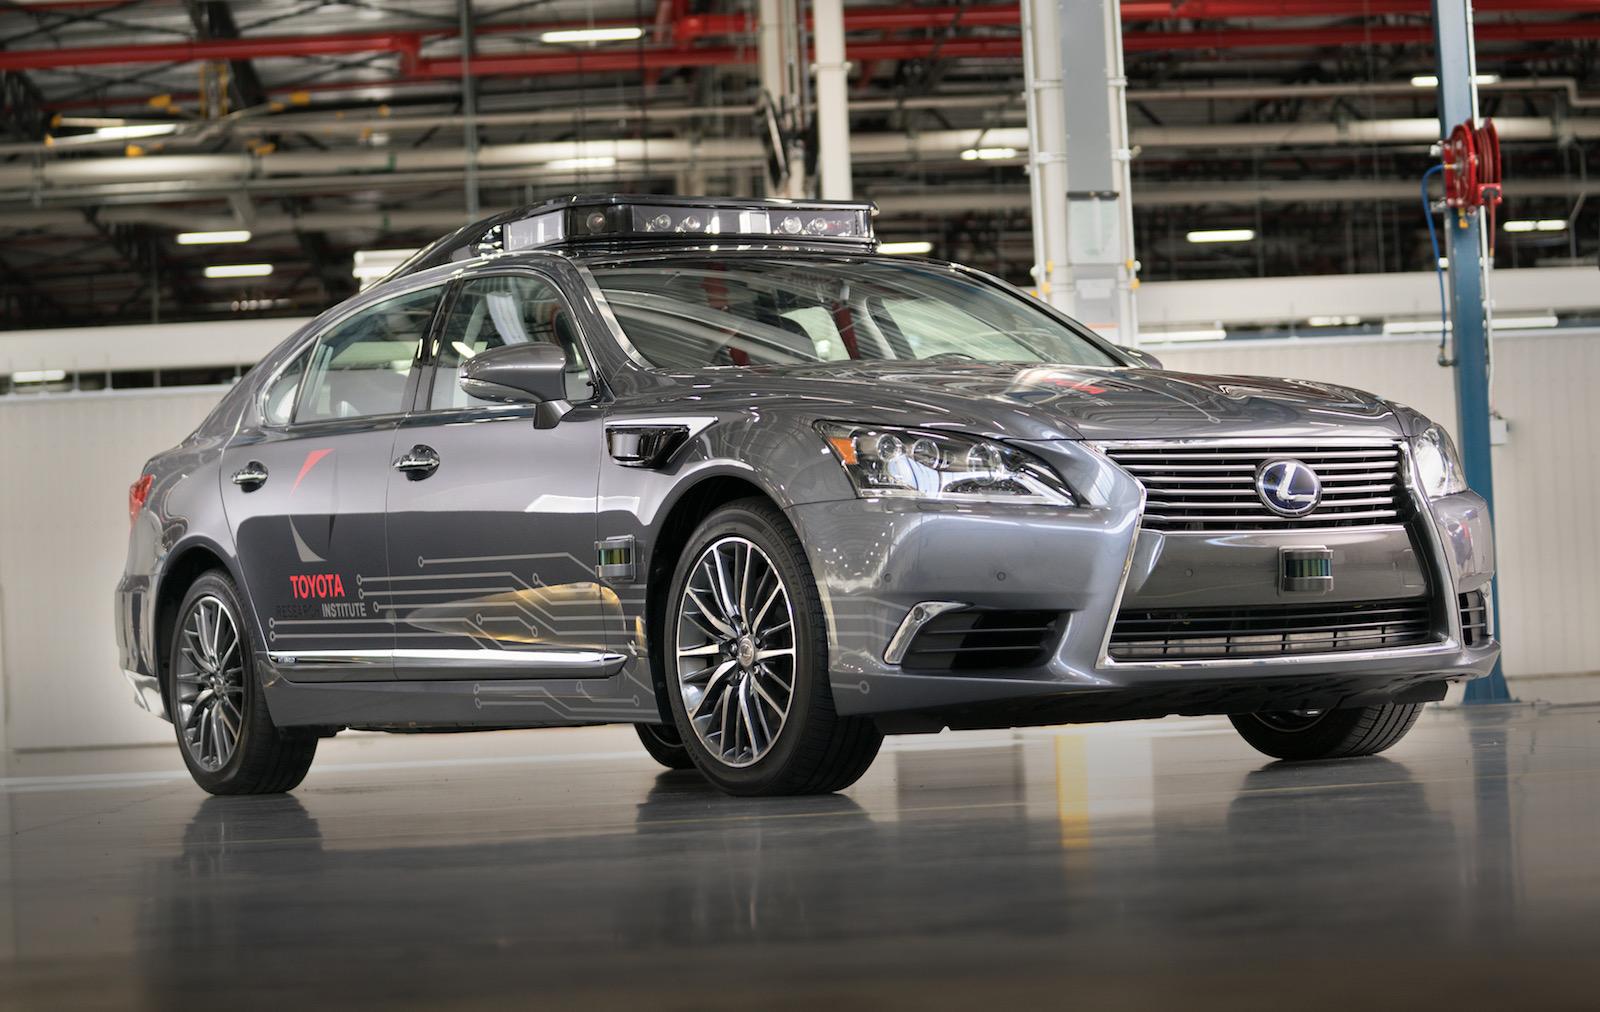 Toyota reveals next-gen autonomous prototype; Platform 3.0